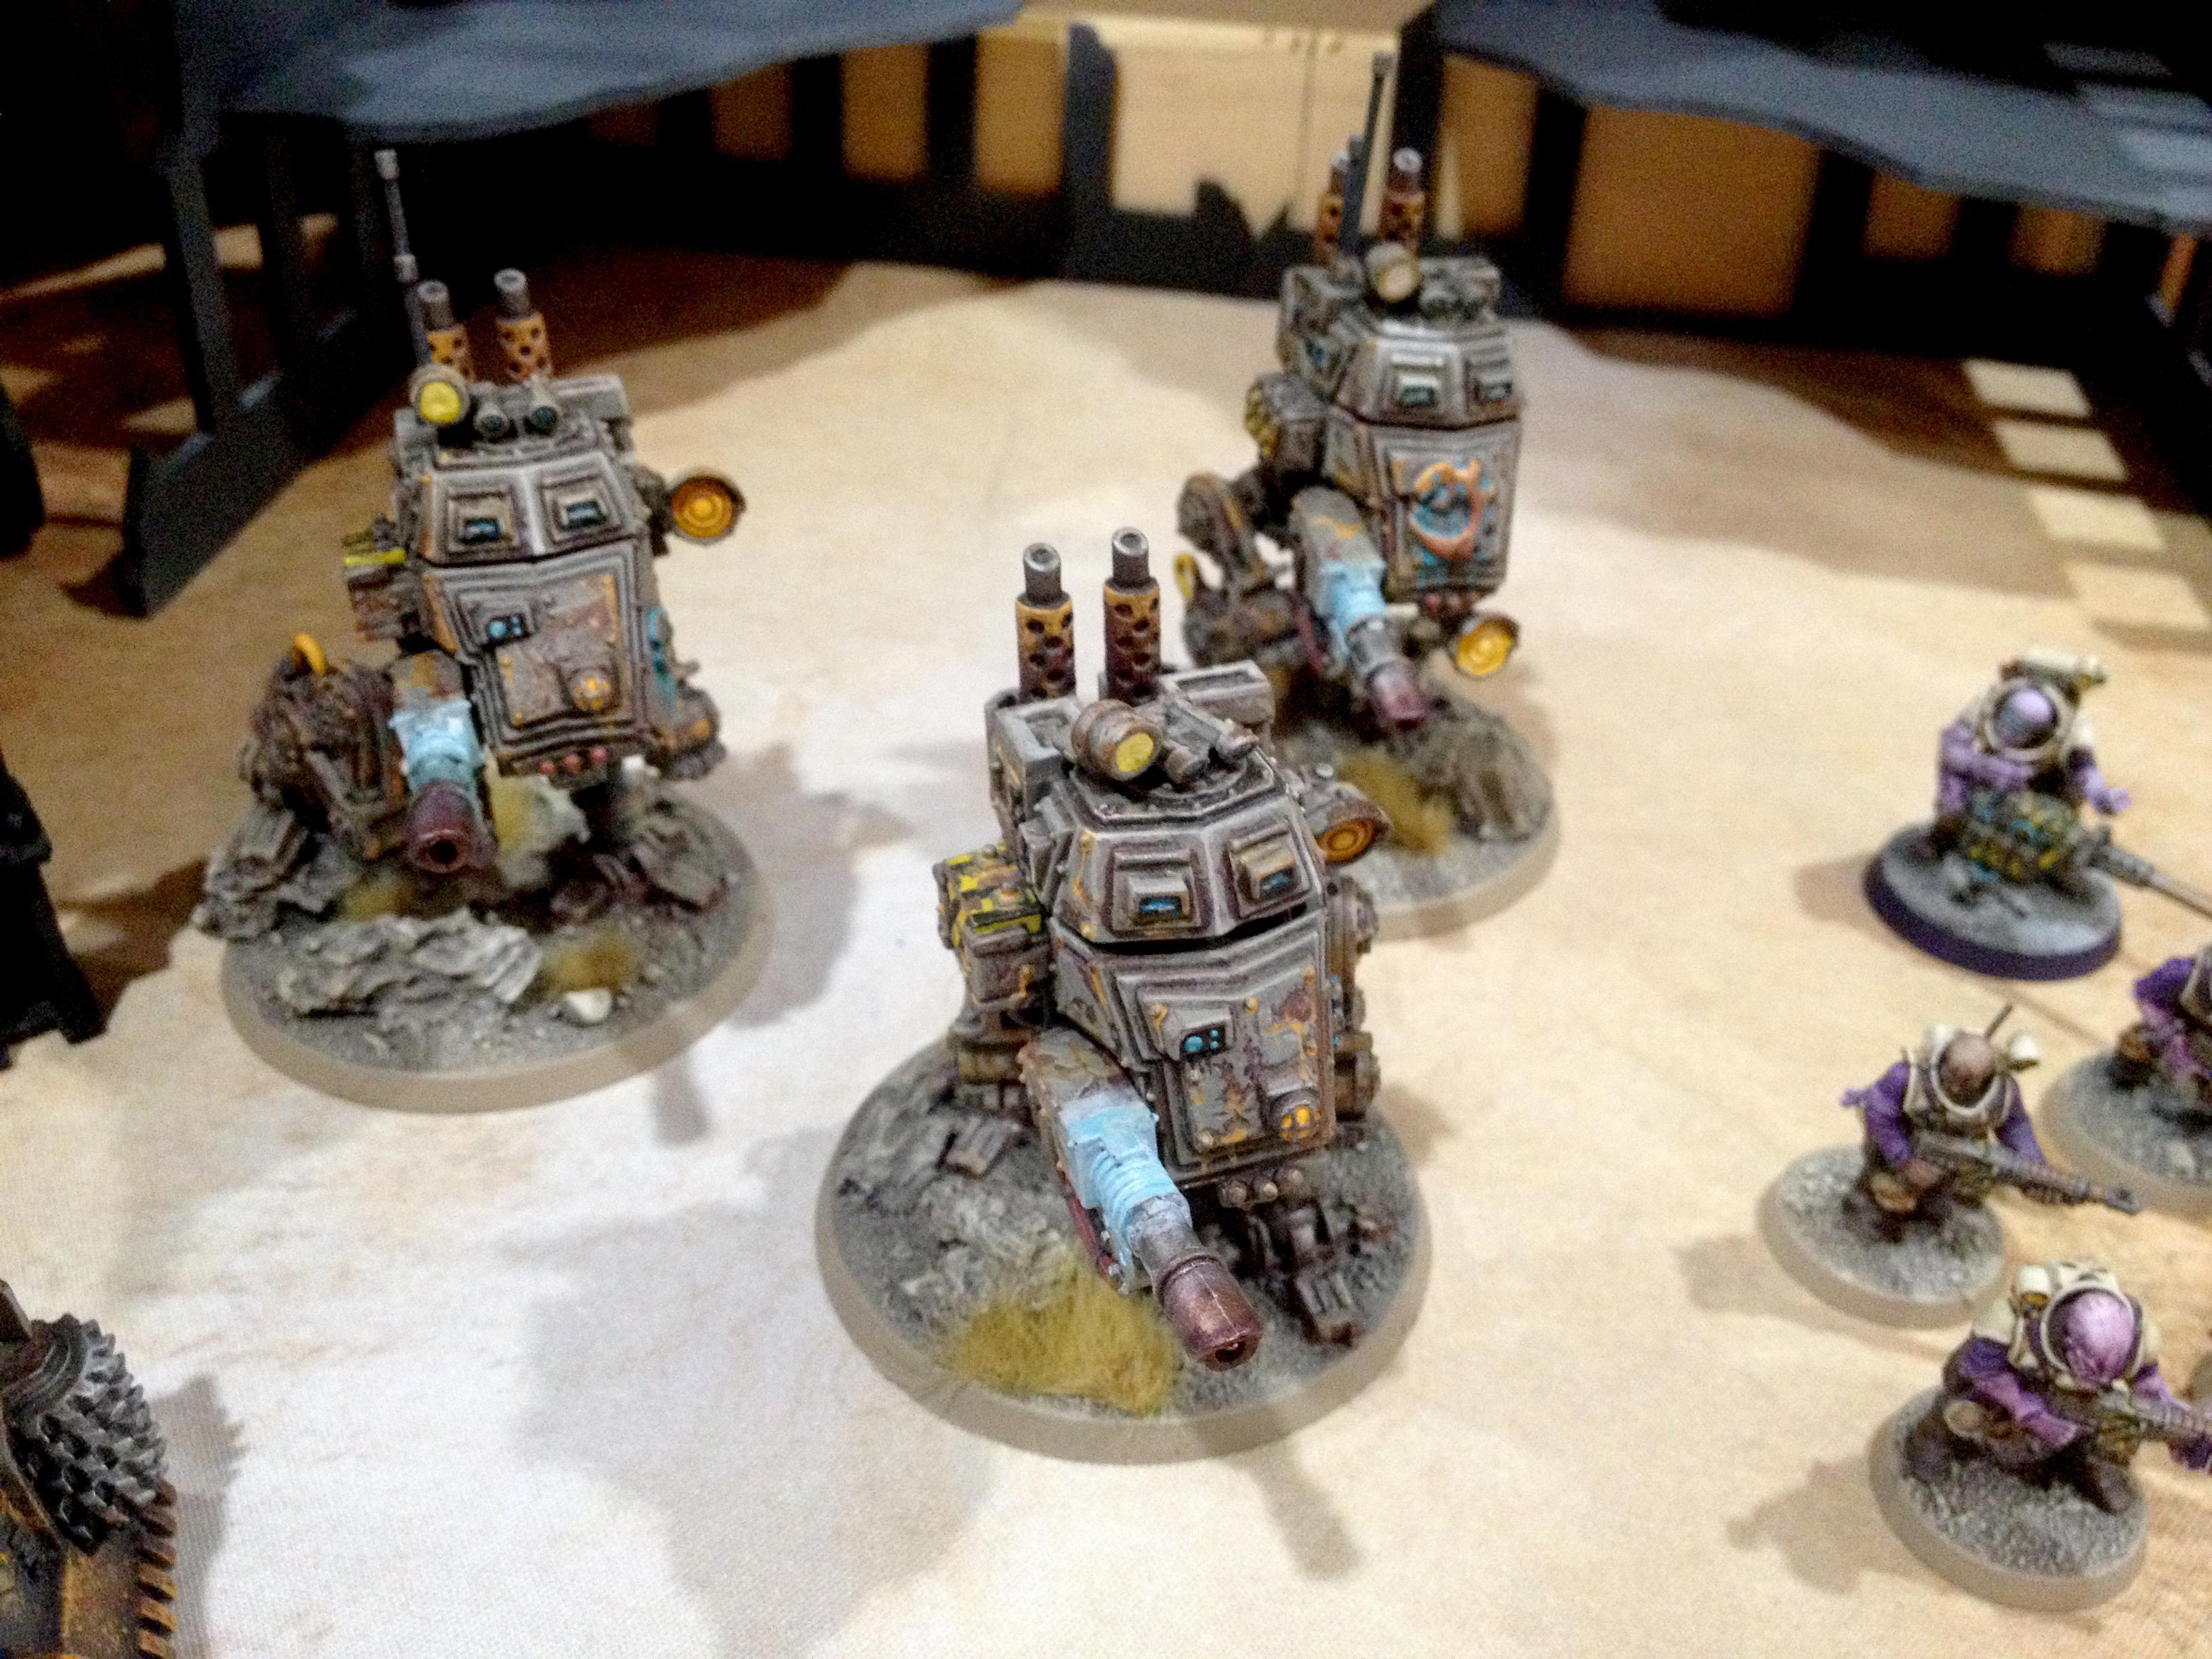 Armoured Sentinel, Brood Brothers, Genestealer, Genestealer Cult, Gsc, Sentinel, Warhammer 40,000, Weathered